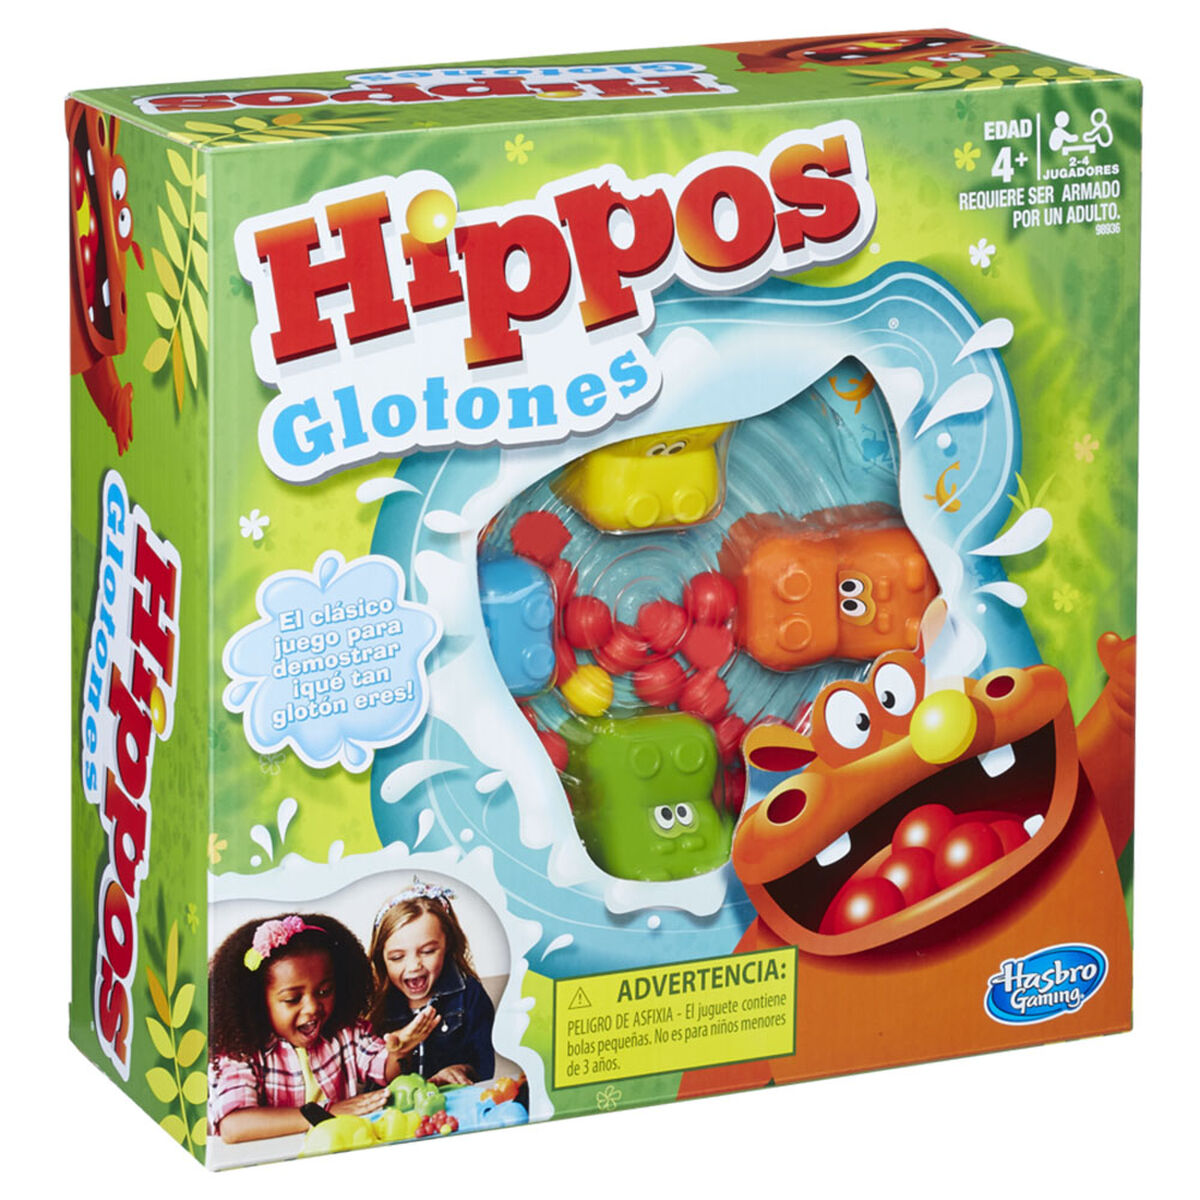 Hippos Glotones